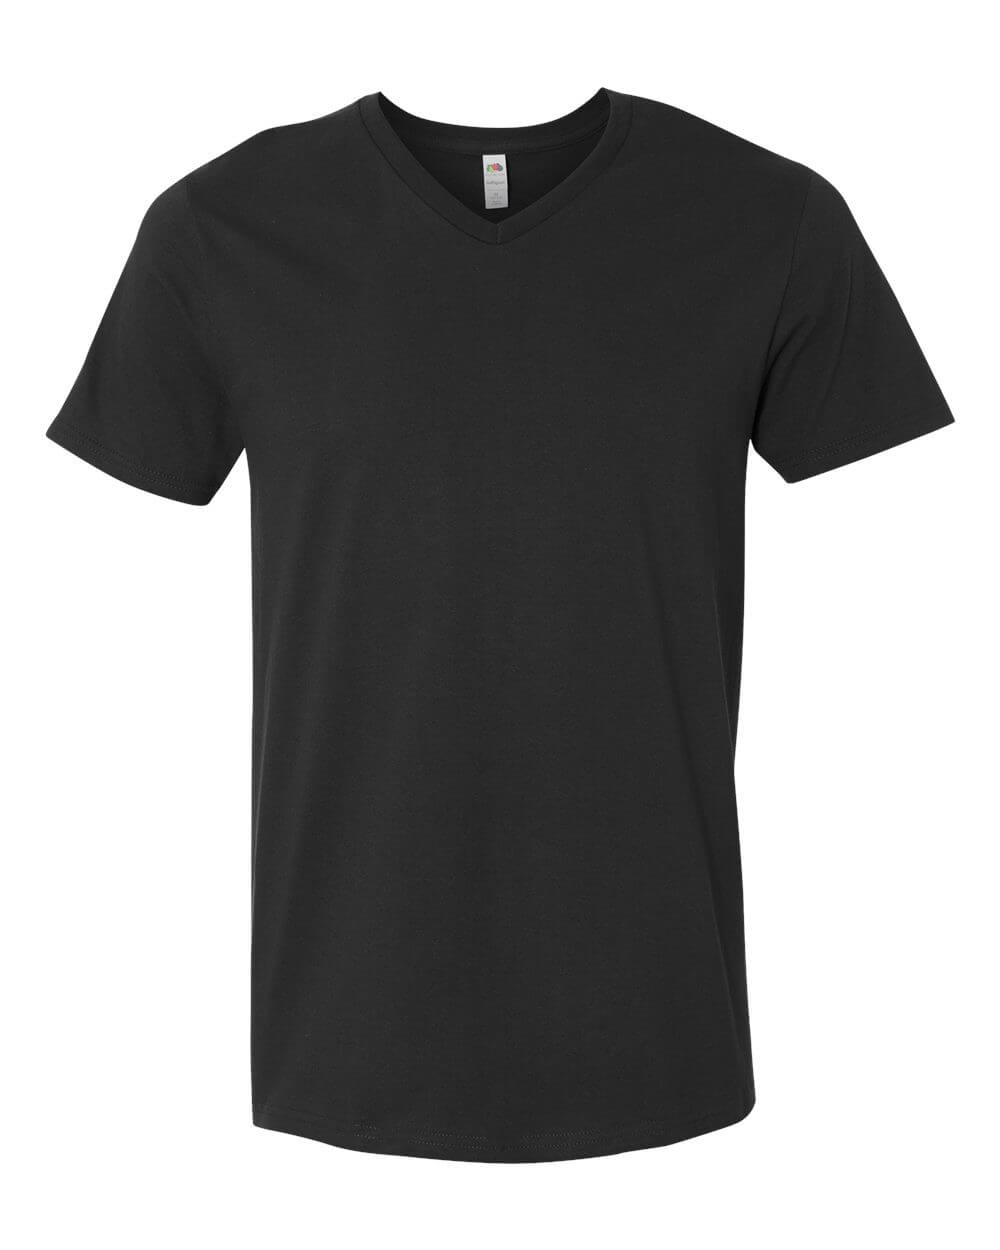 Fruit-of-the-Loom-Mens-V-Neck-Sofspun-Black-Custom-T-Shirts